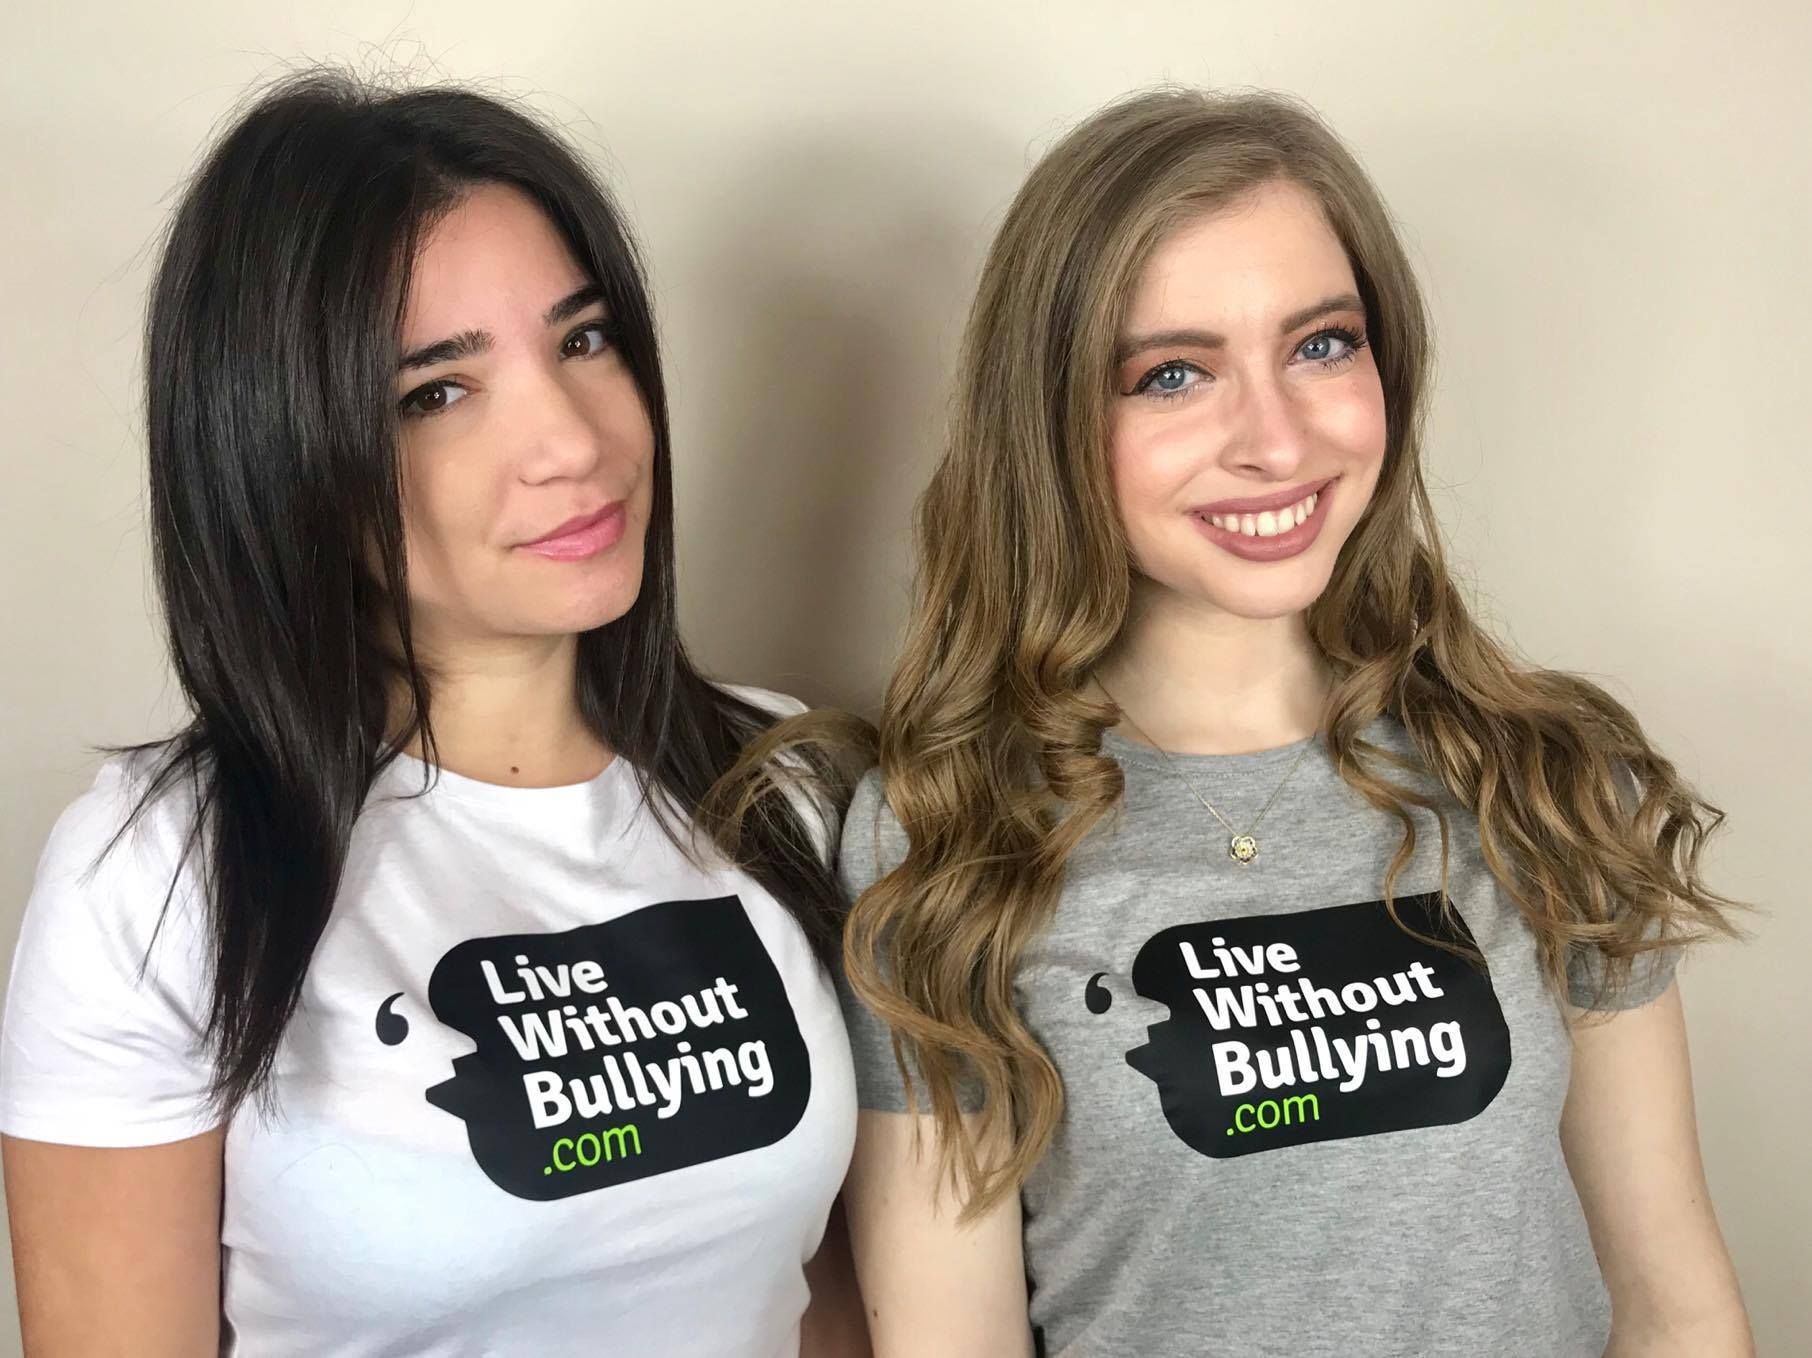 2Girls1 Map & χρήσιμα tips για τον εκφοβισμό